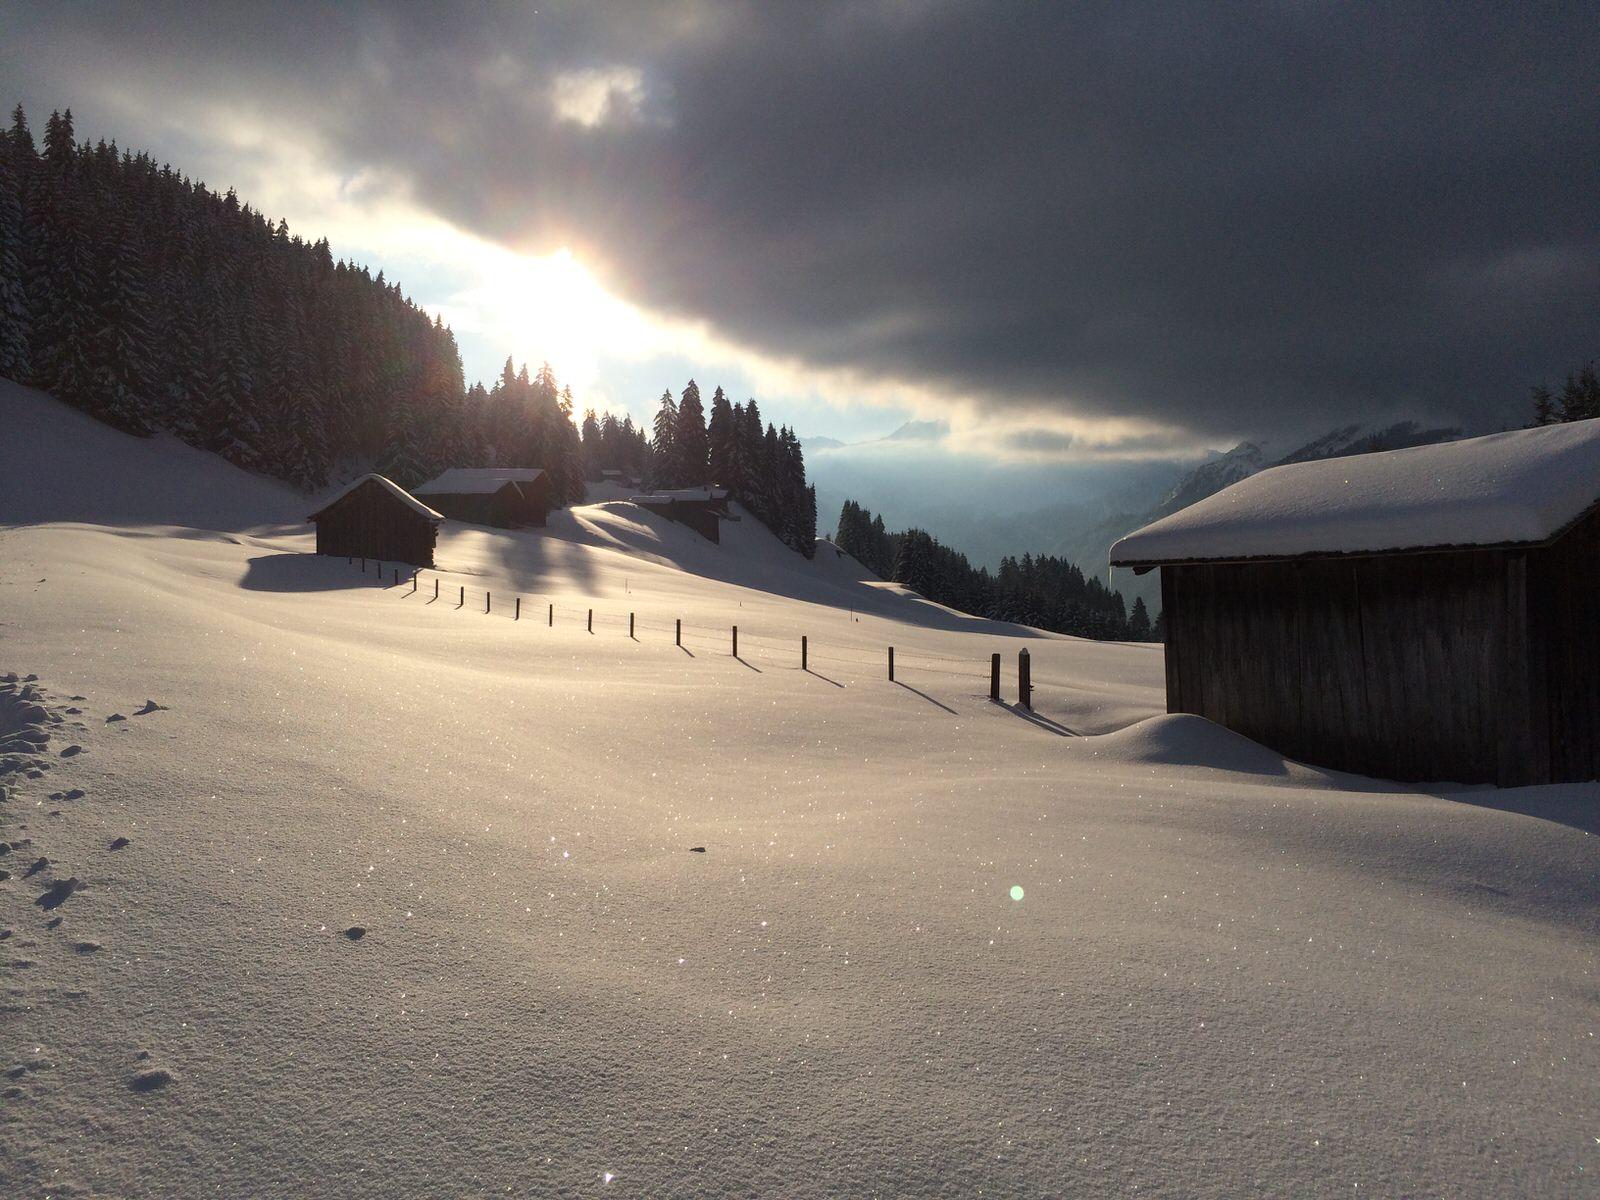 Mountain lodge Bartholomäberg winter in the Montafon - Fritzasee